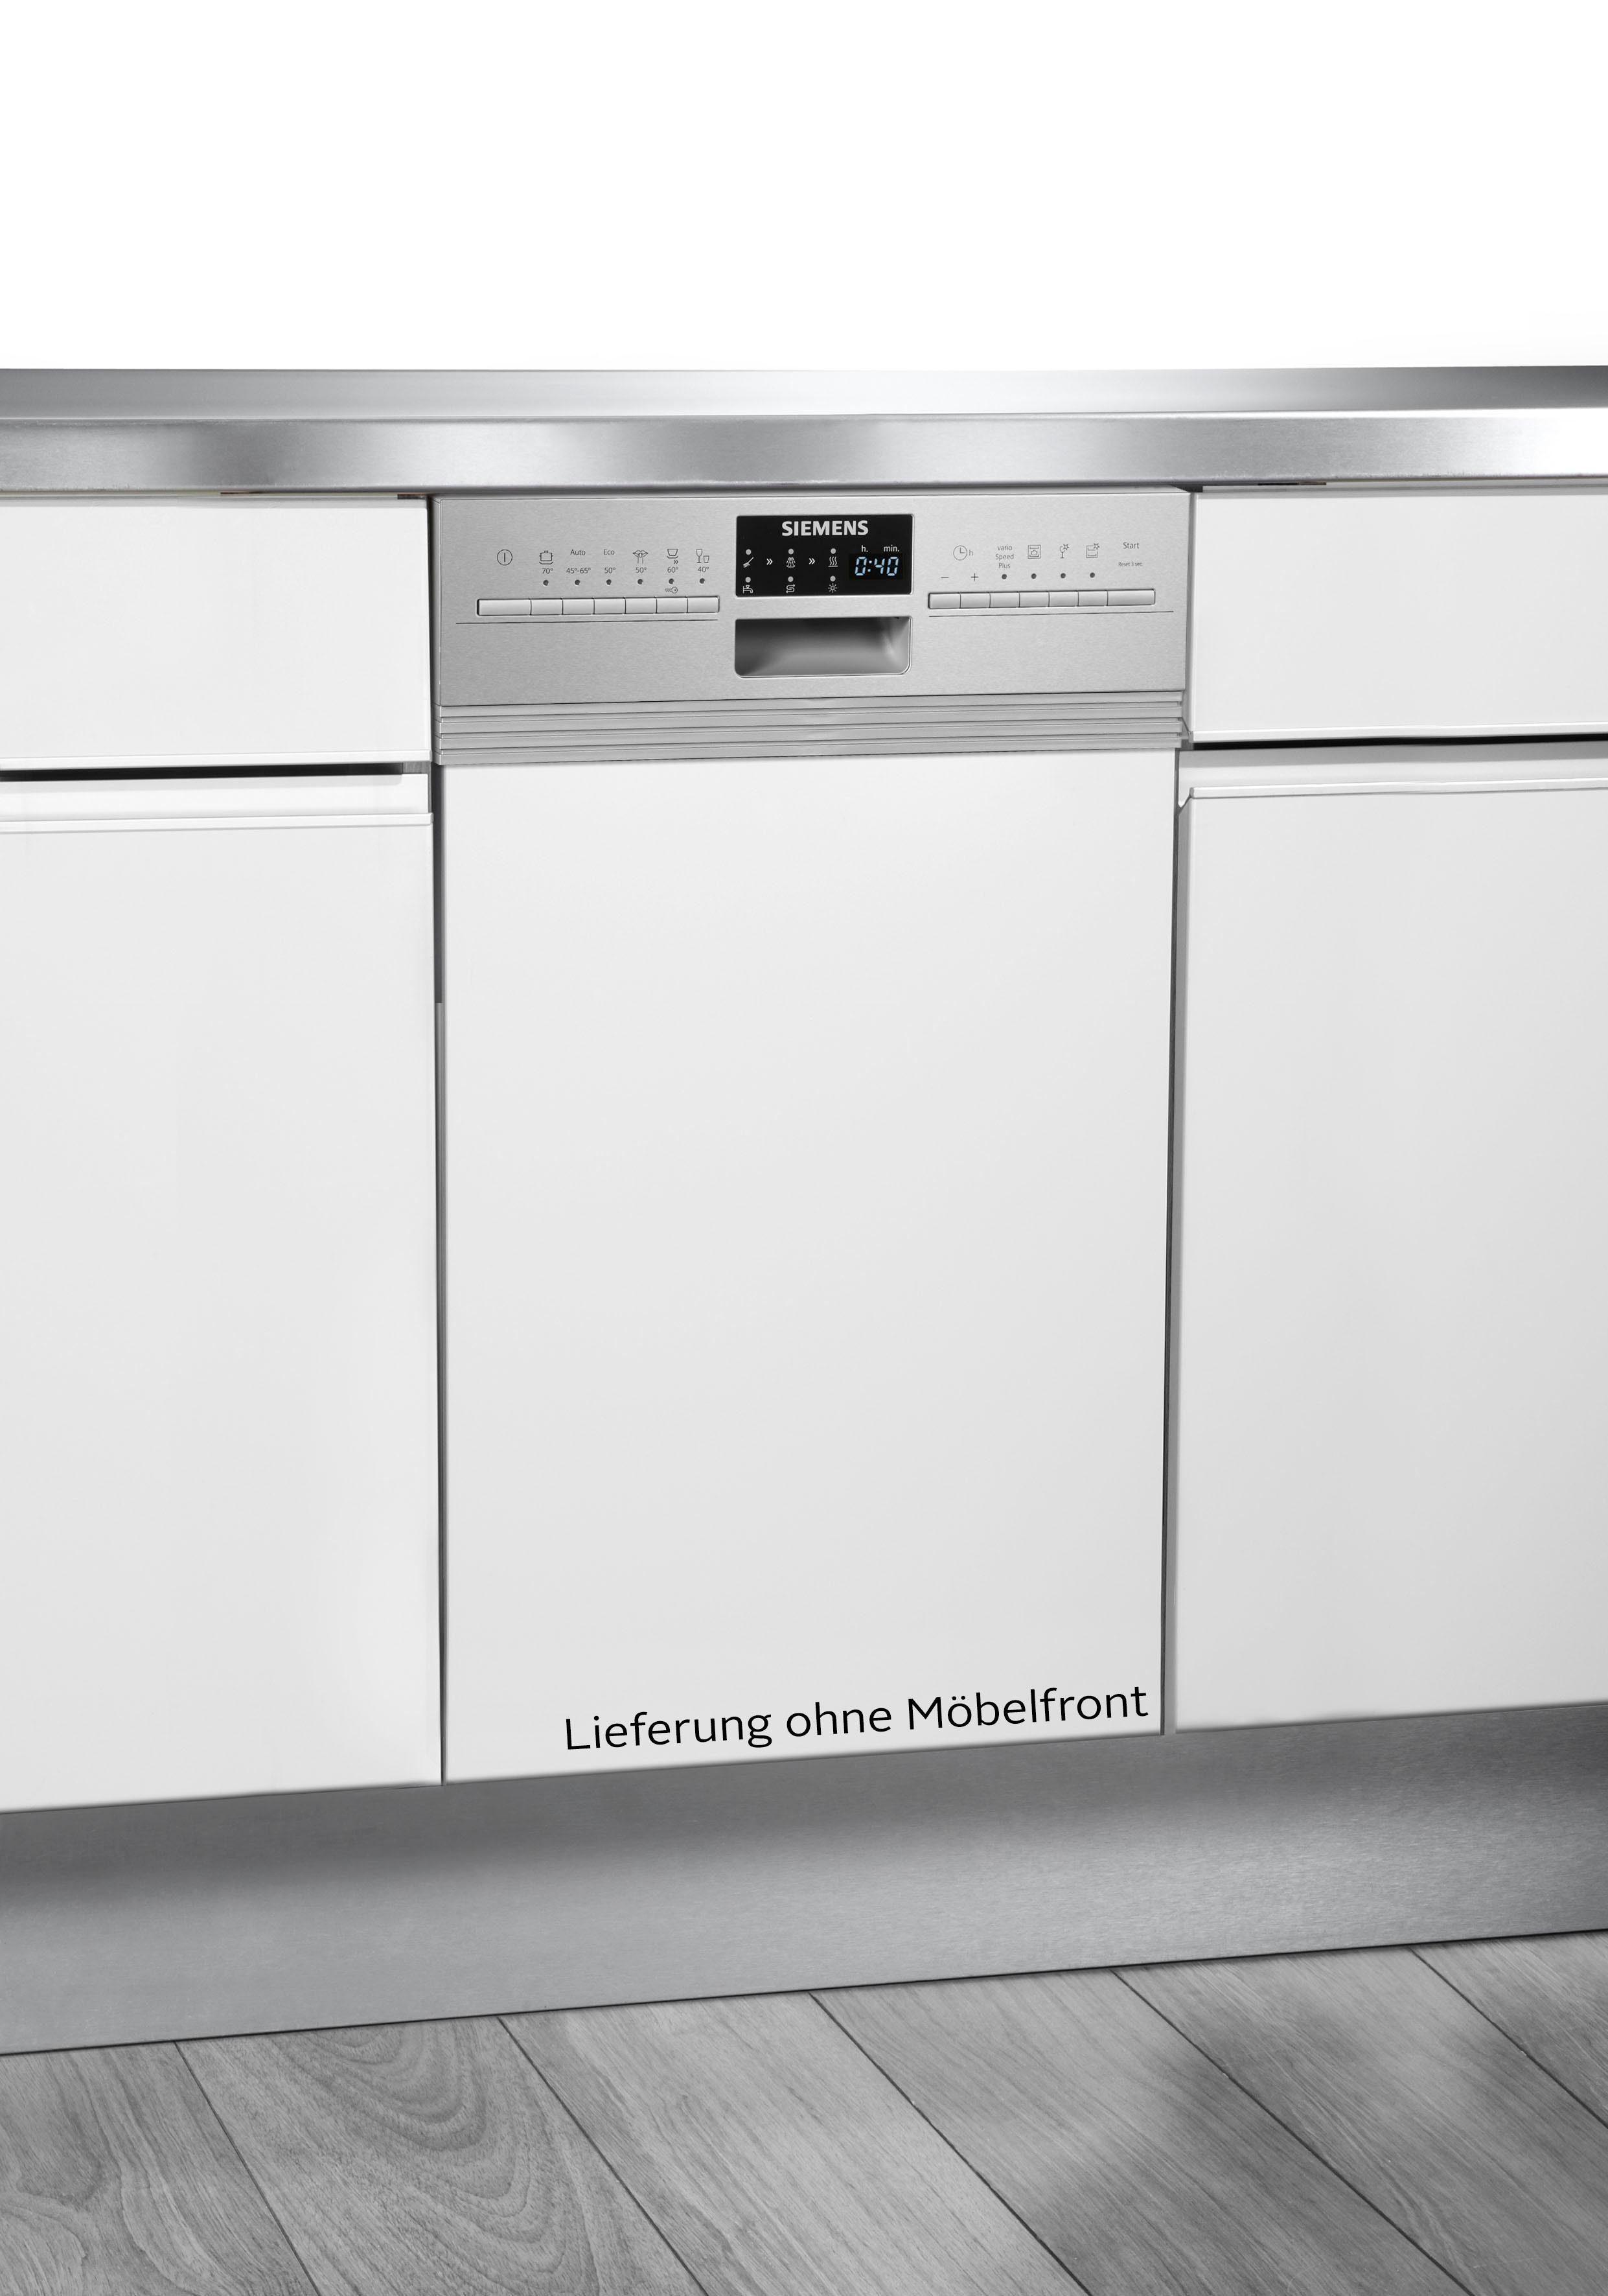 SIEMENS teilintegrierbarer Geschirrspüler, SR556S01TE, 9,5 l, 10 Maßgedecke, 45 cm breit